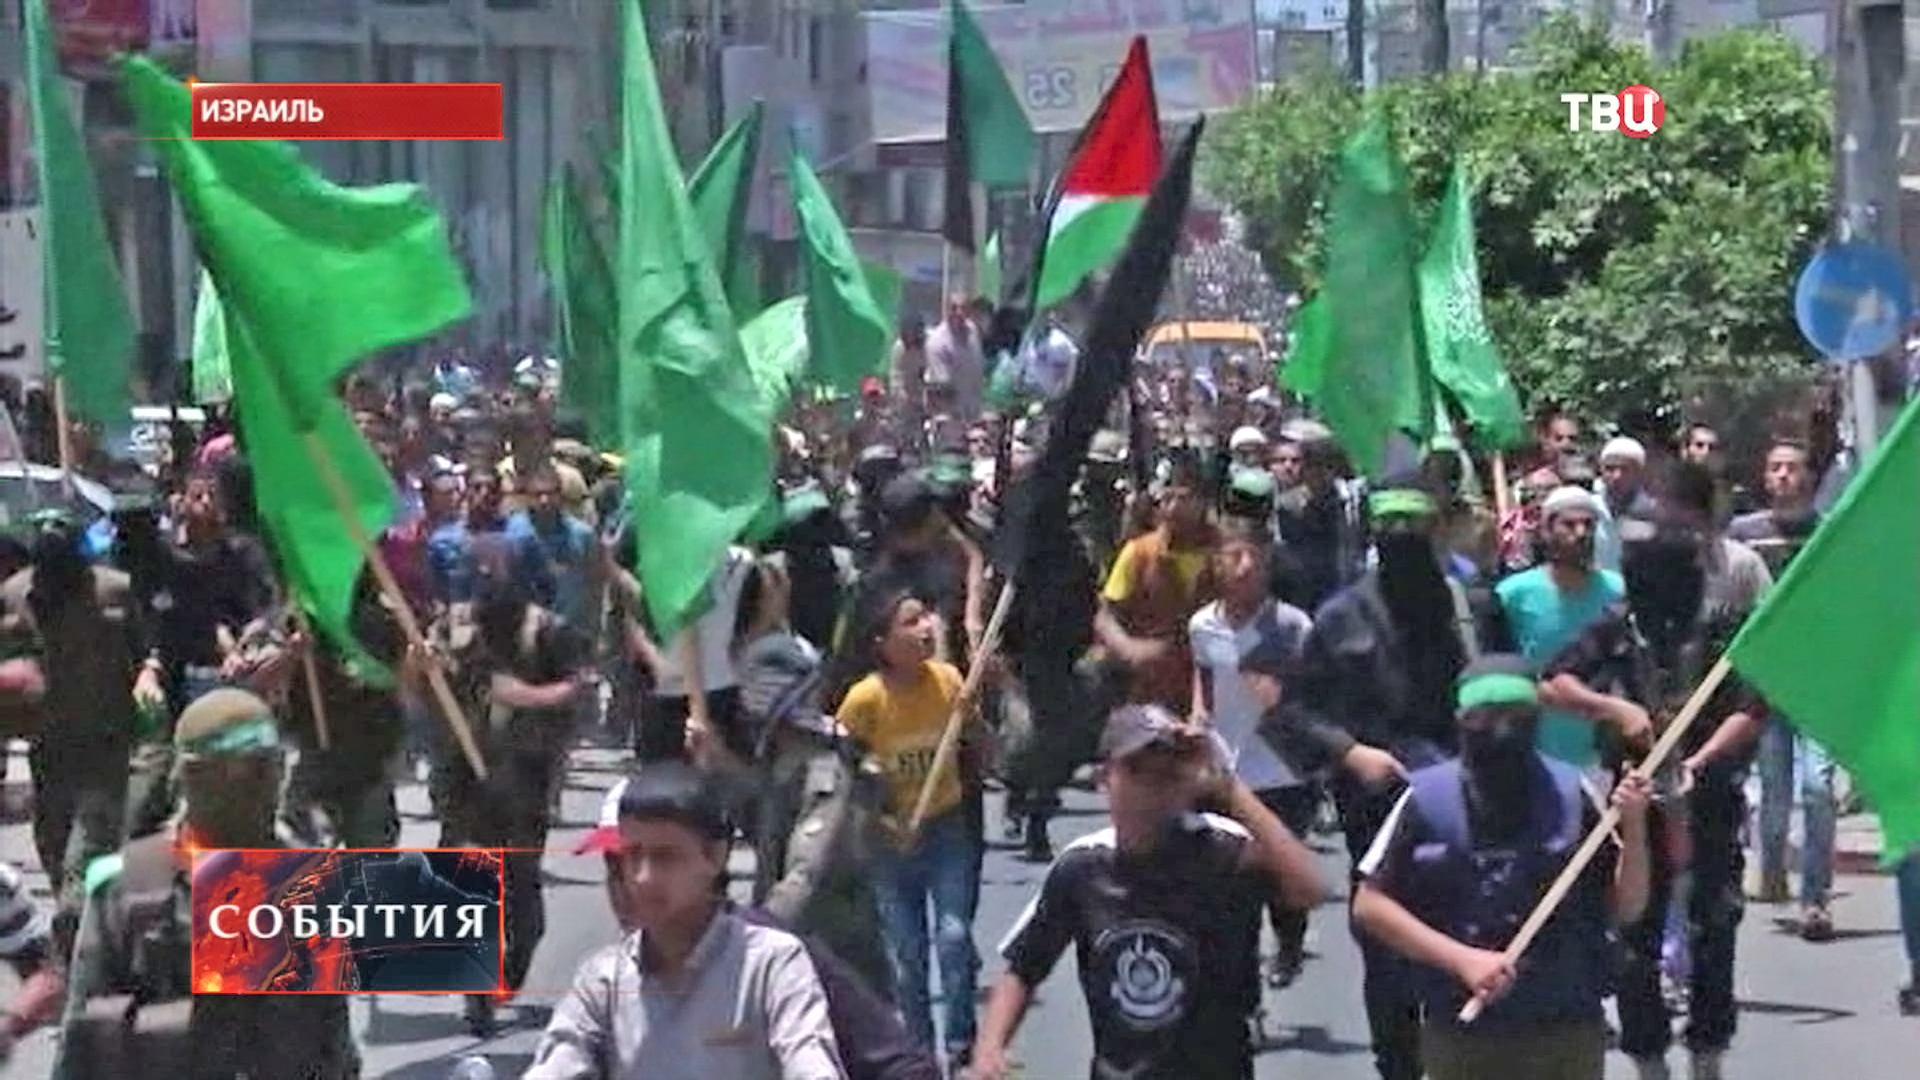 Митинг в Израиле